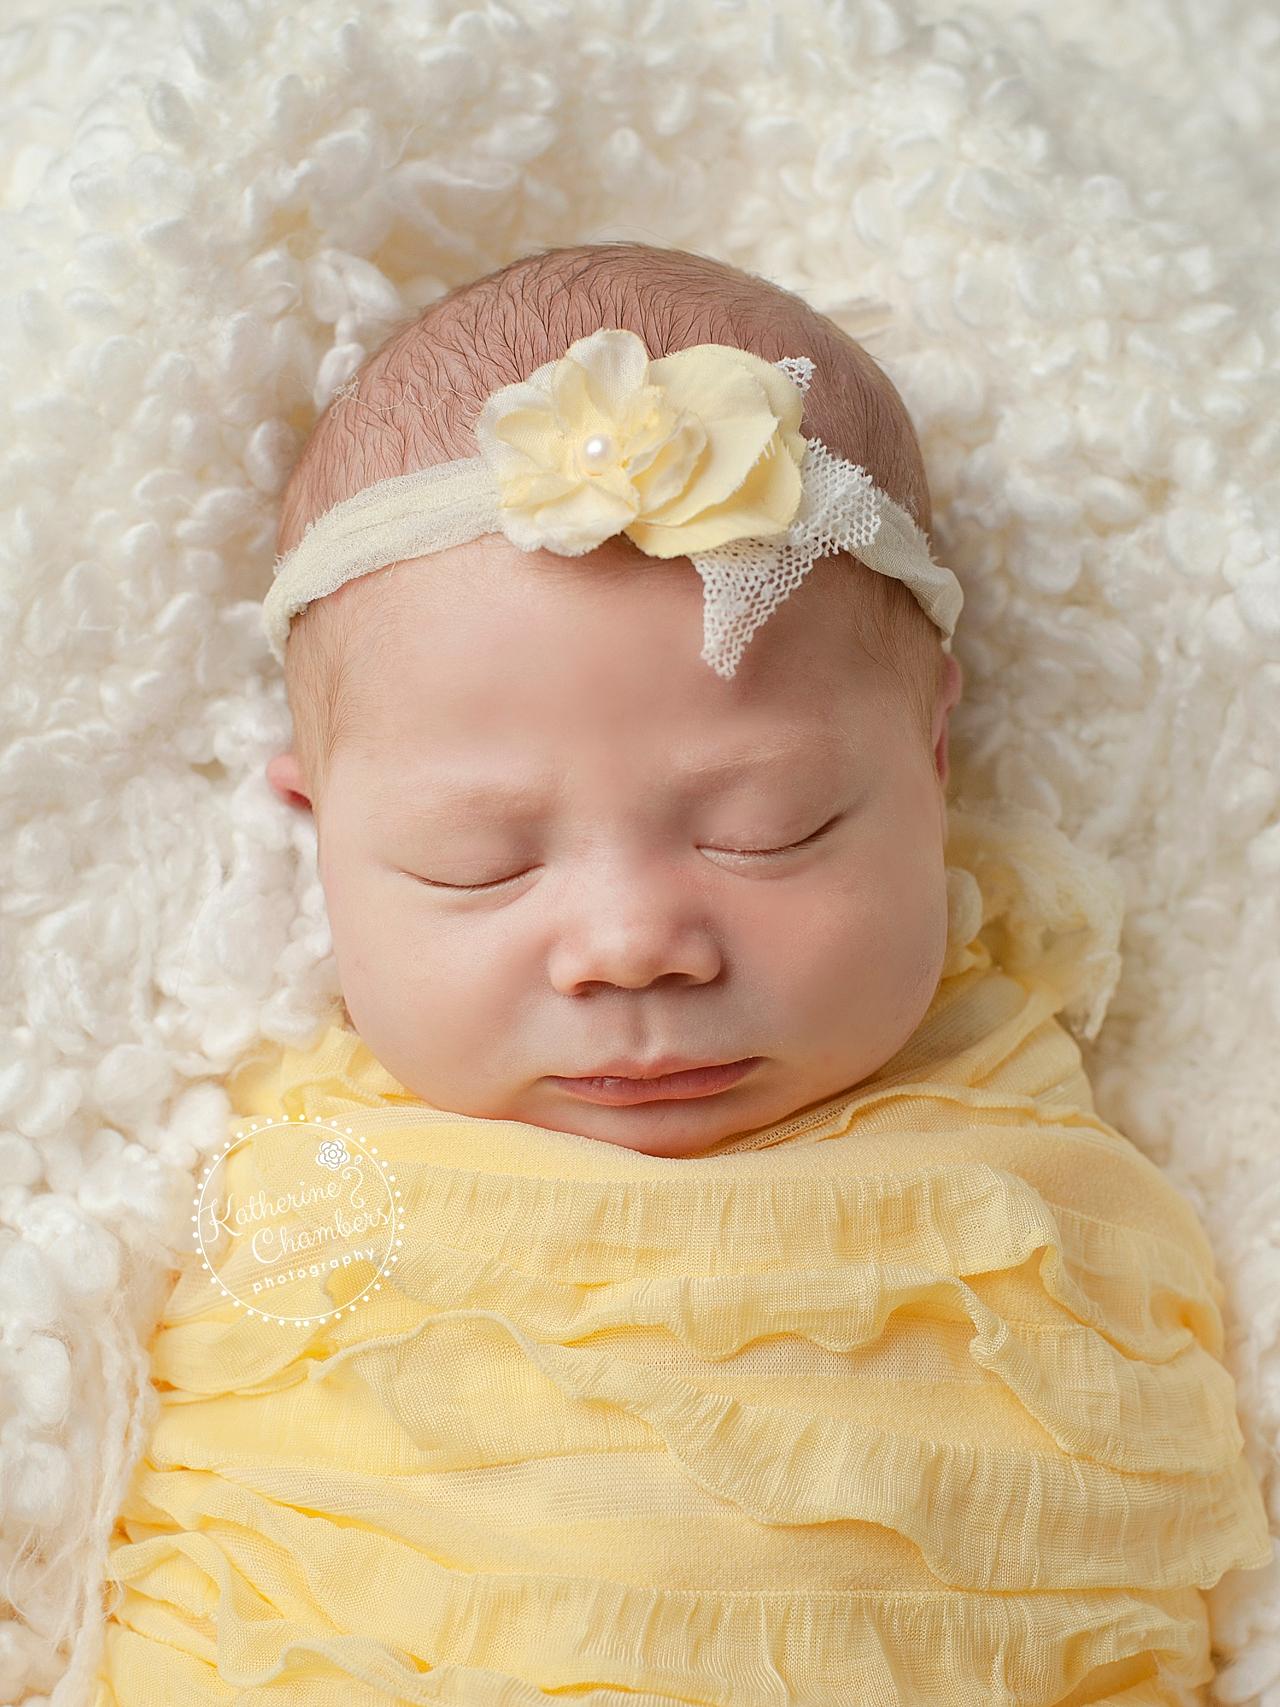 Newborn Baby in Yellow, Cleveland Baby Photographer, Studio Photography